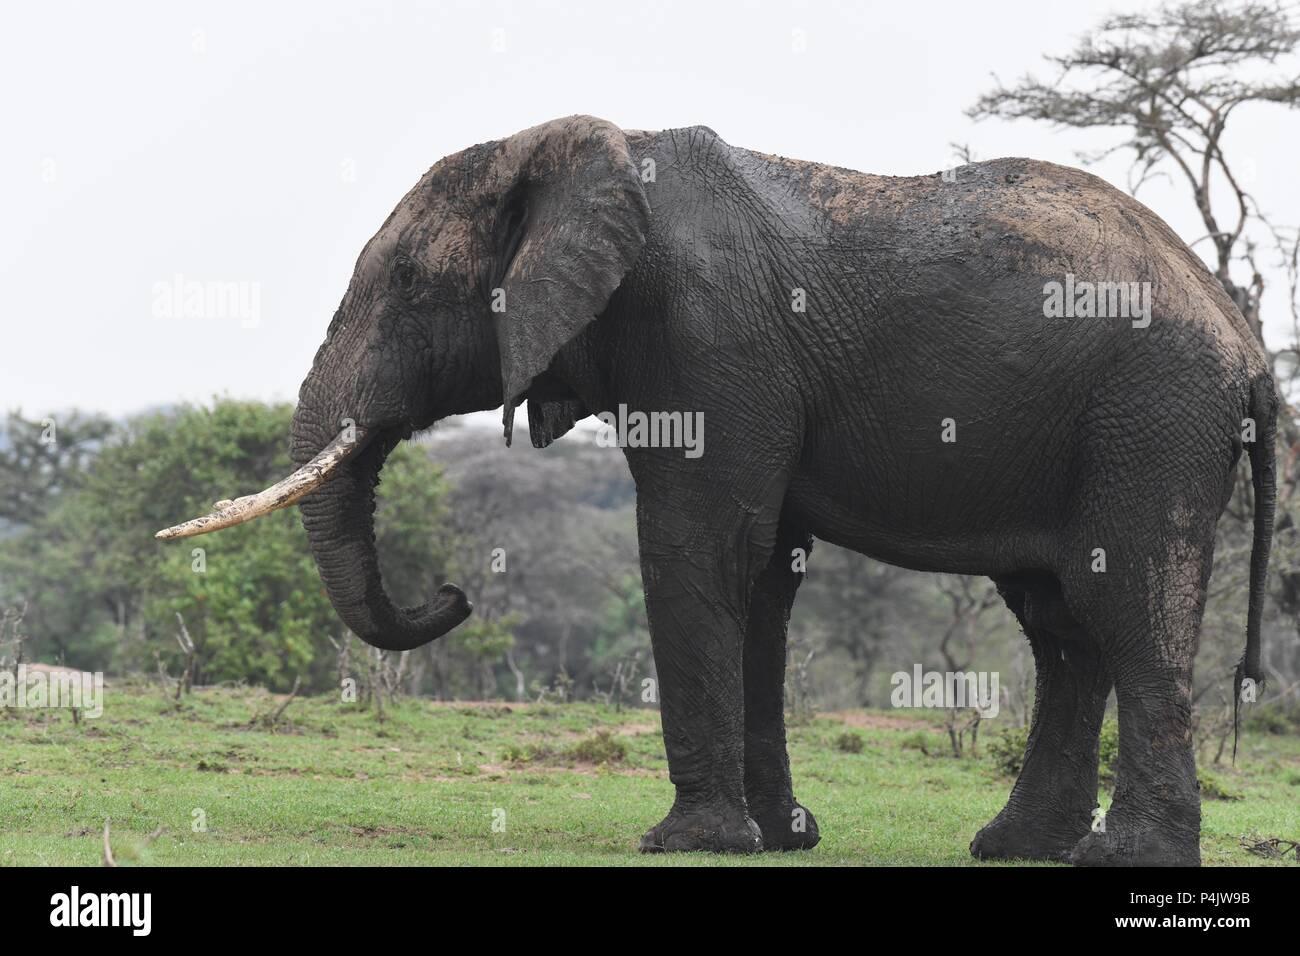 Large lone African Bull Elephant wondering across the Maasai Mara, Kenya. Large intact tusks. Genus Loxodonta - Stock Image